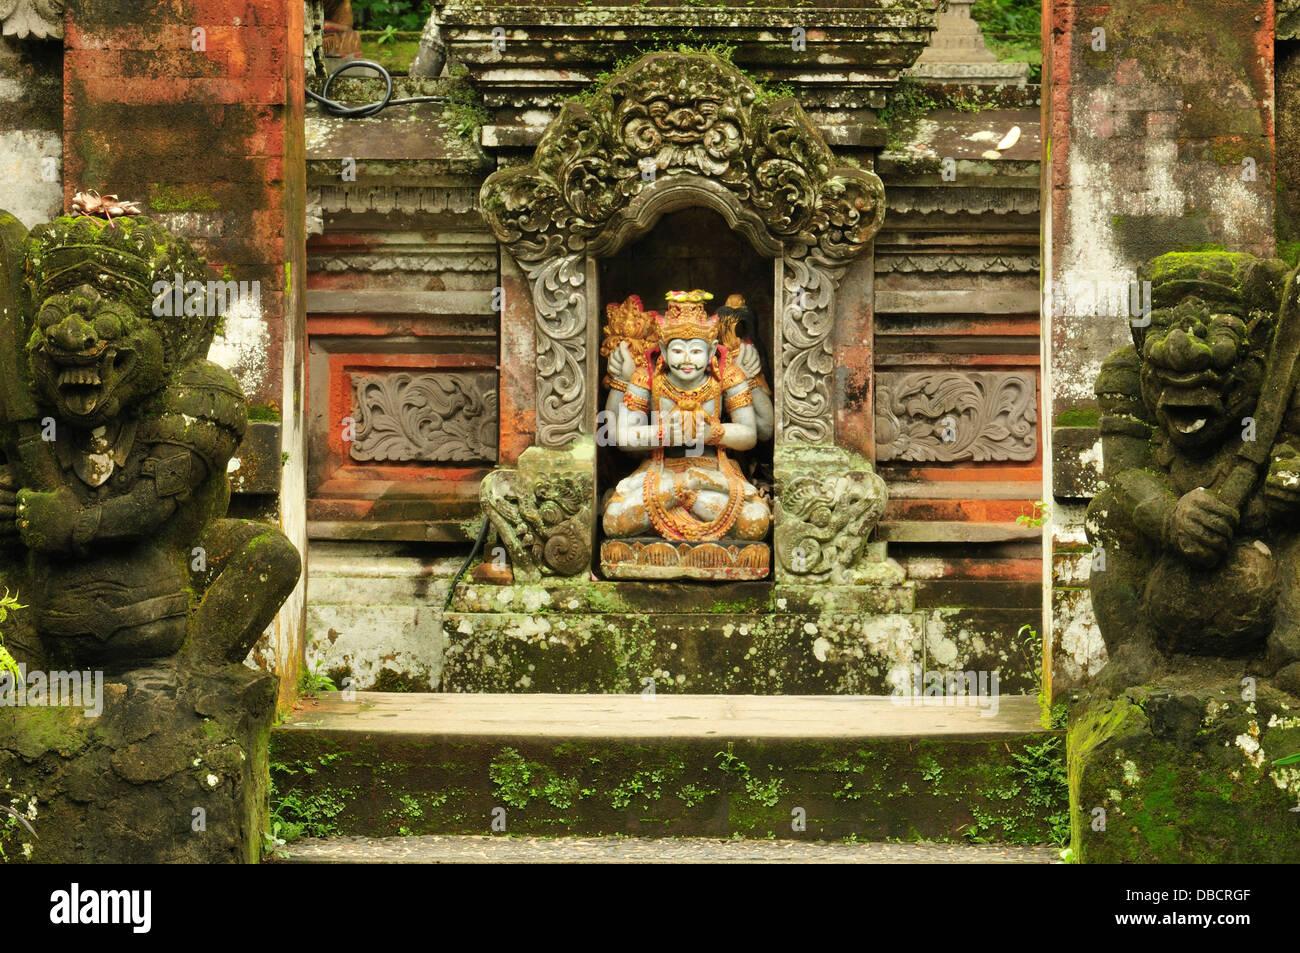 Pura Gunung Lebah Temple, Ubud, Bali, Indonesia, Asia - Stock Image